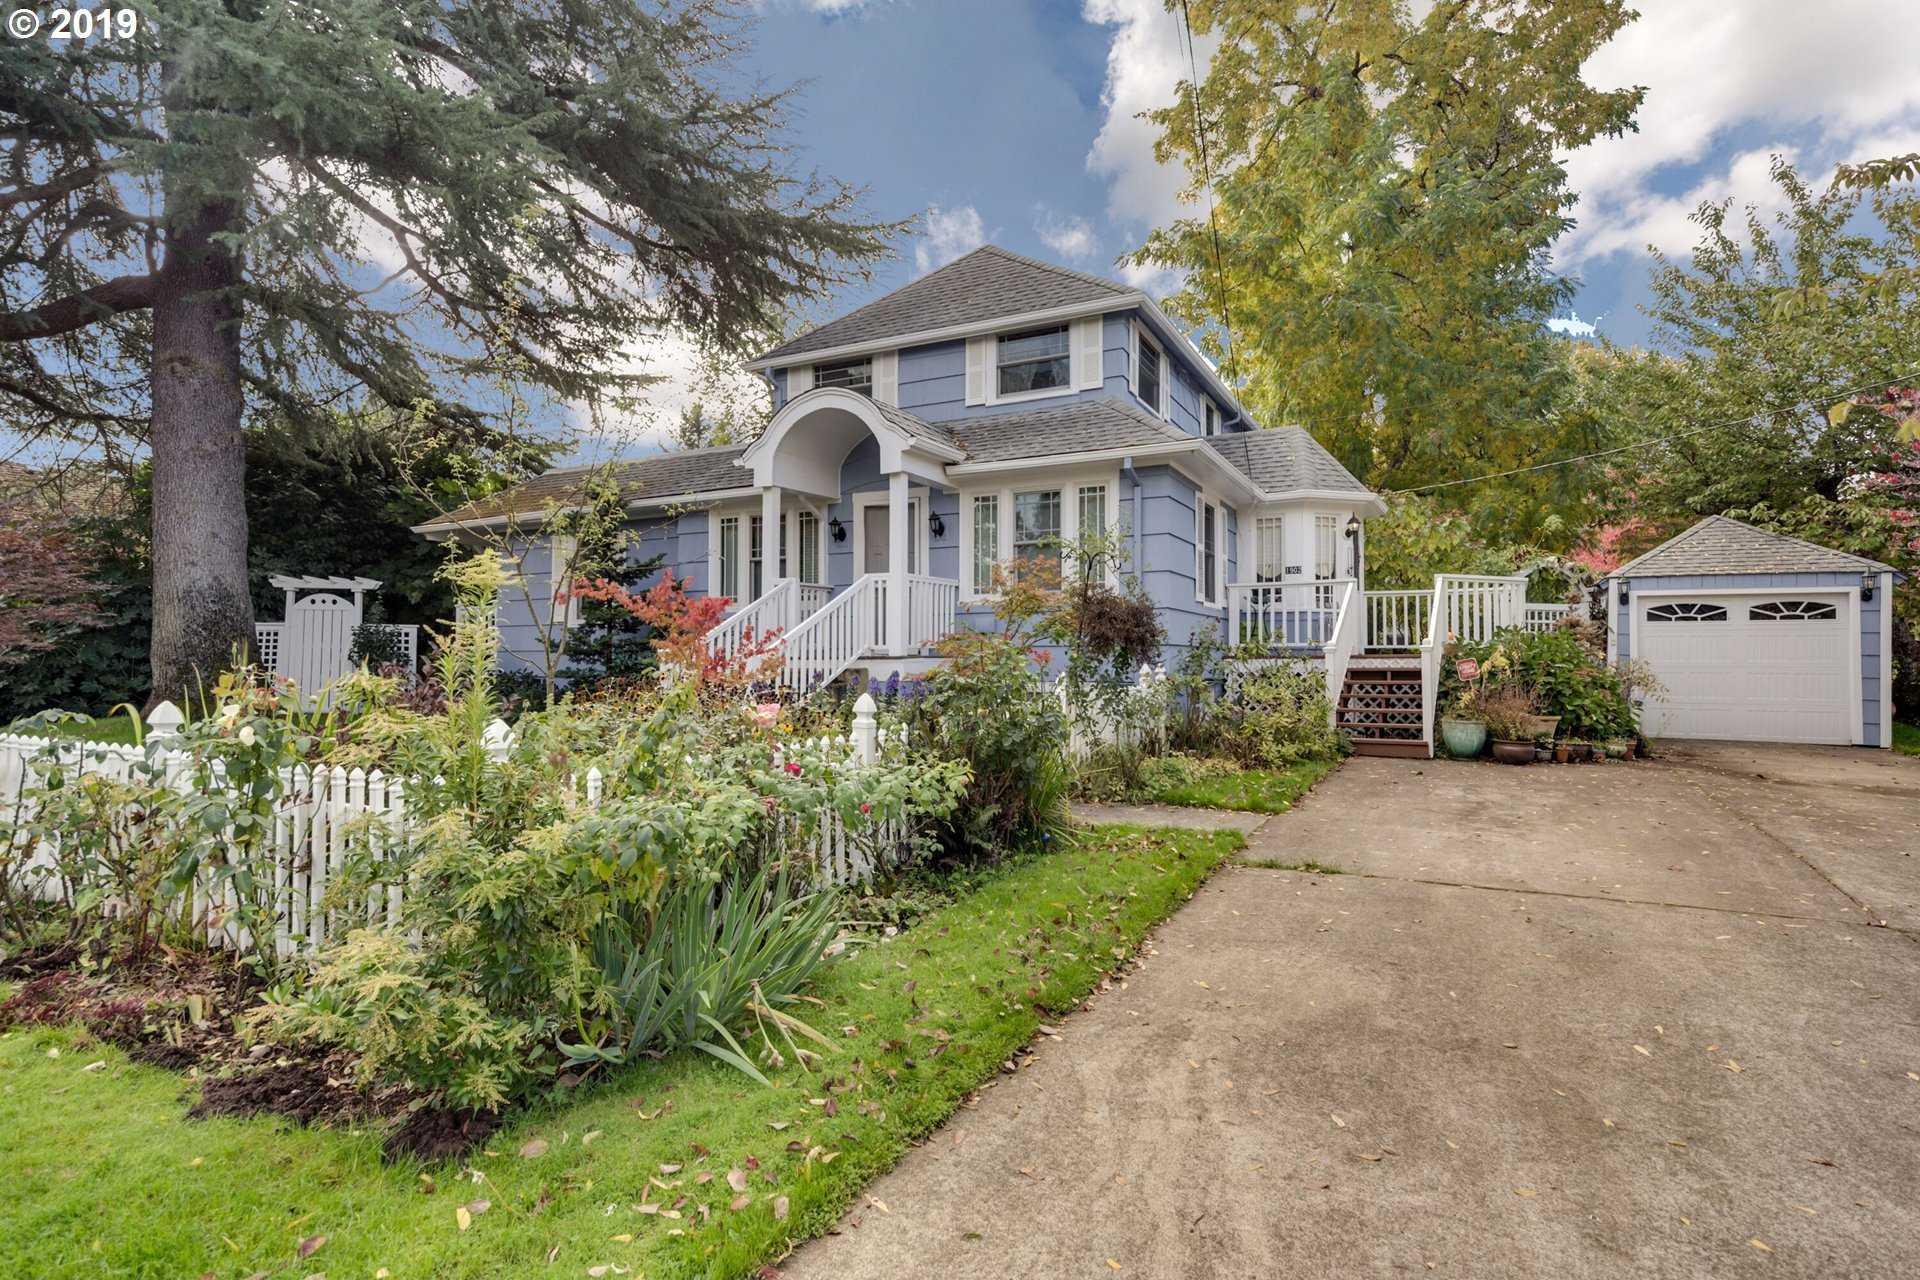 $499,500 - 3Br/3Ba -  for Sale in Oregon City, Oregon City